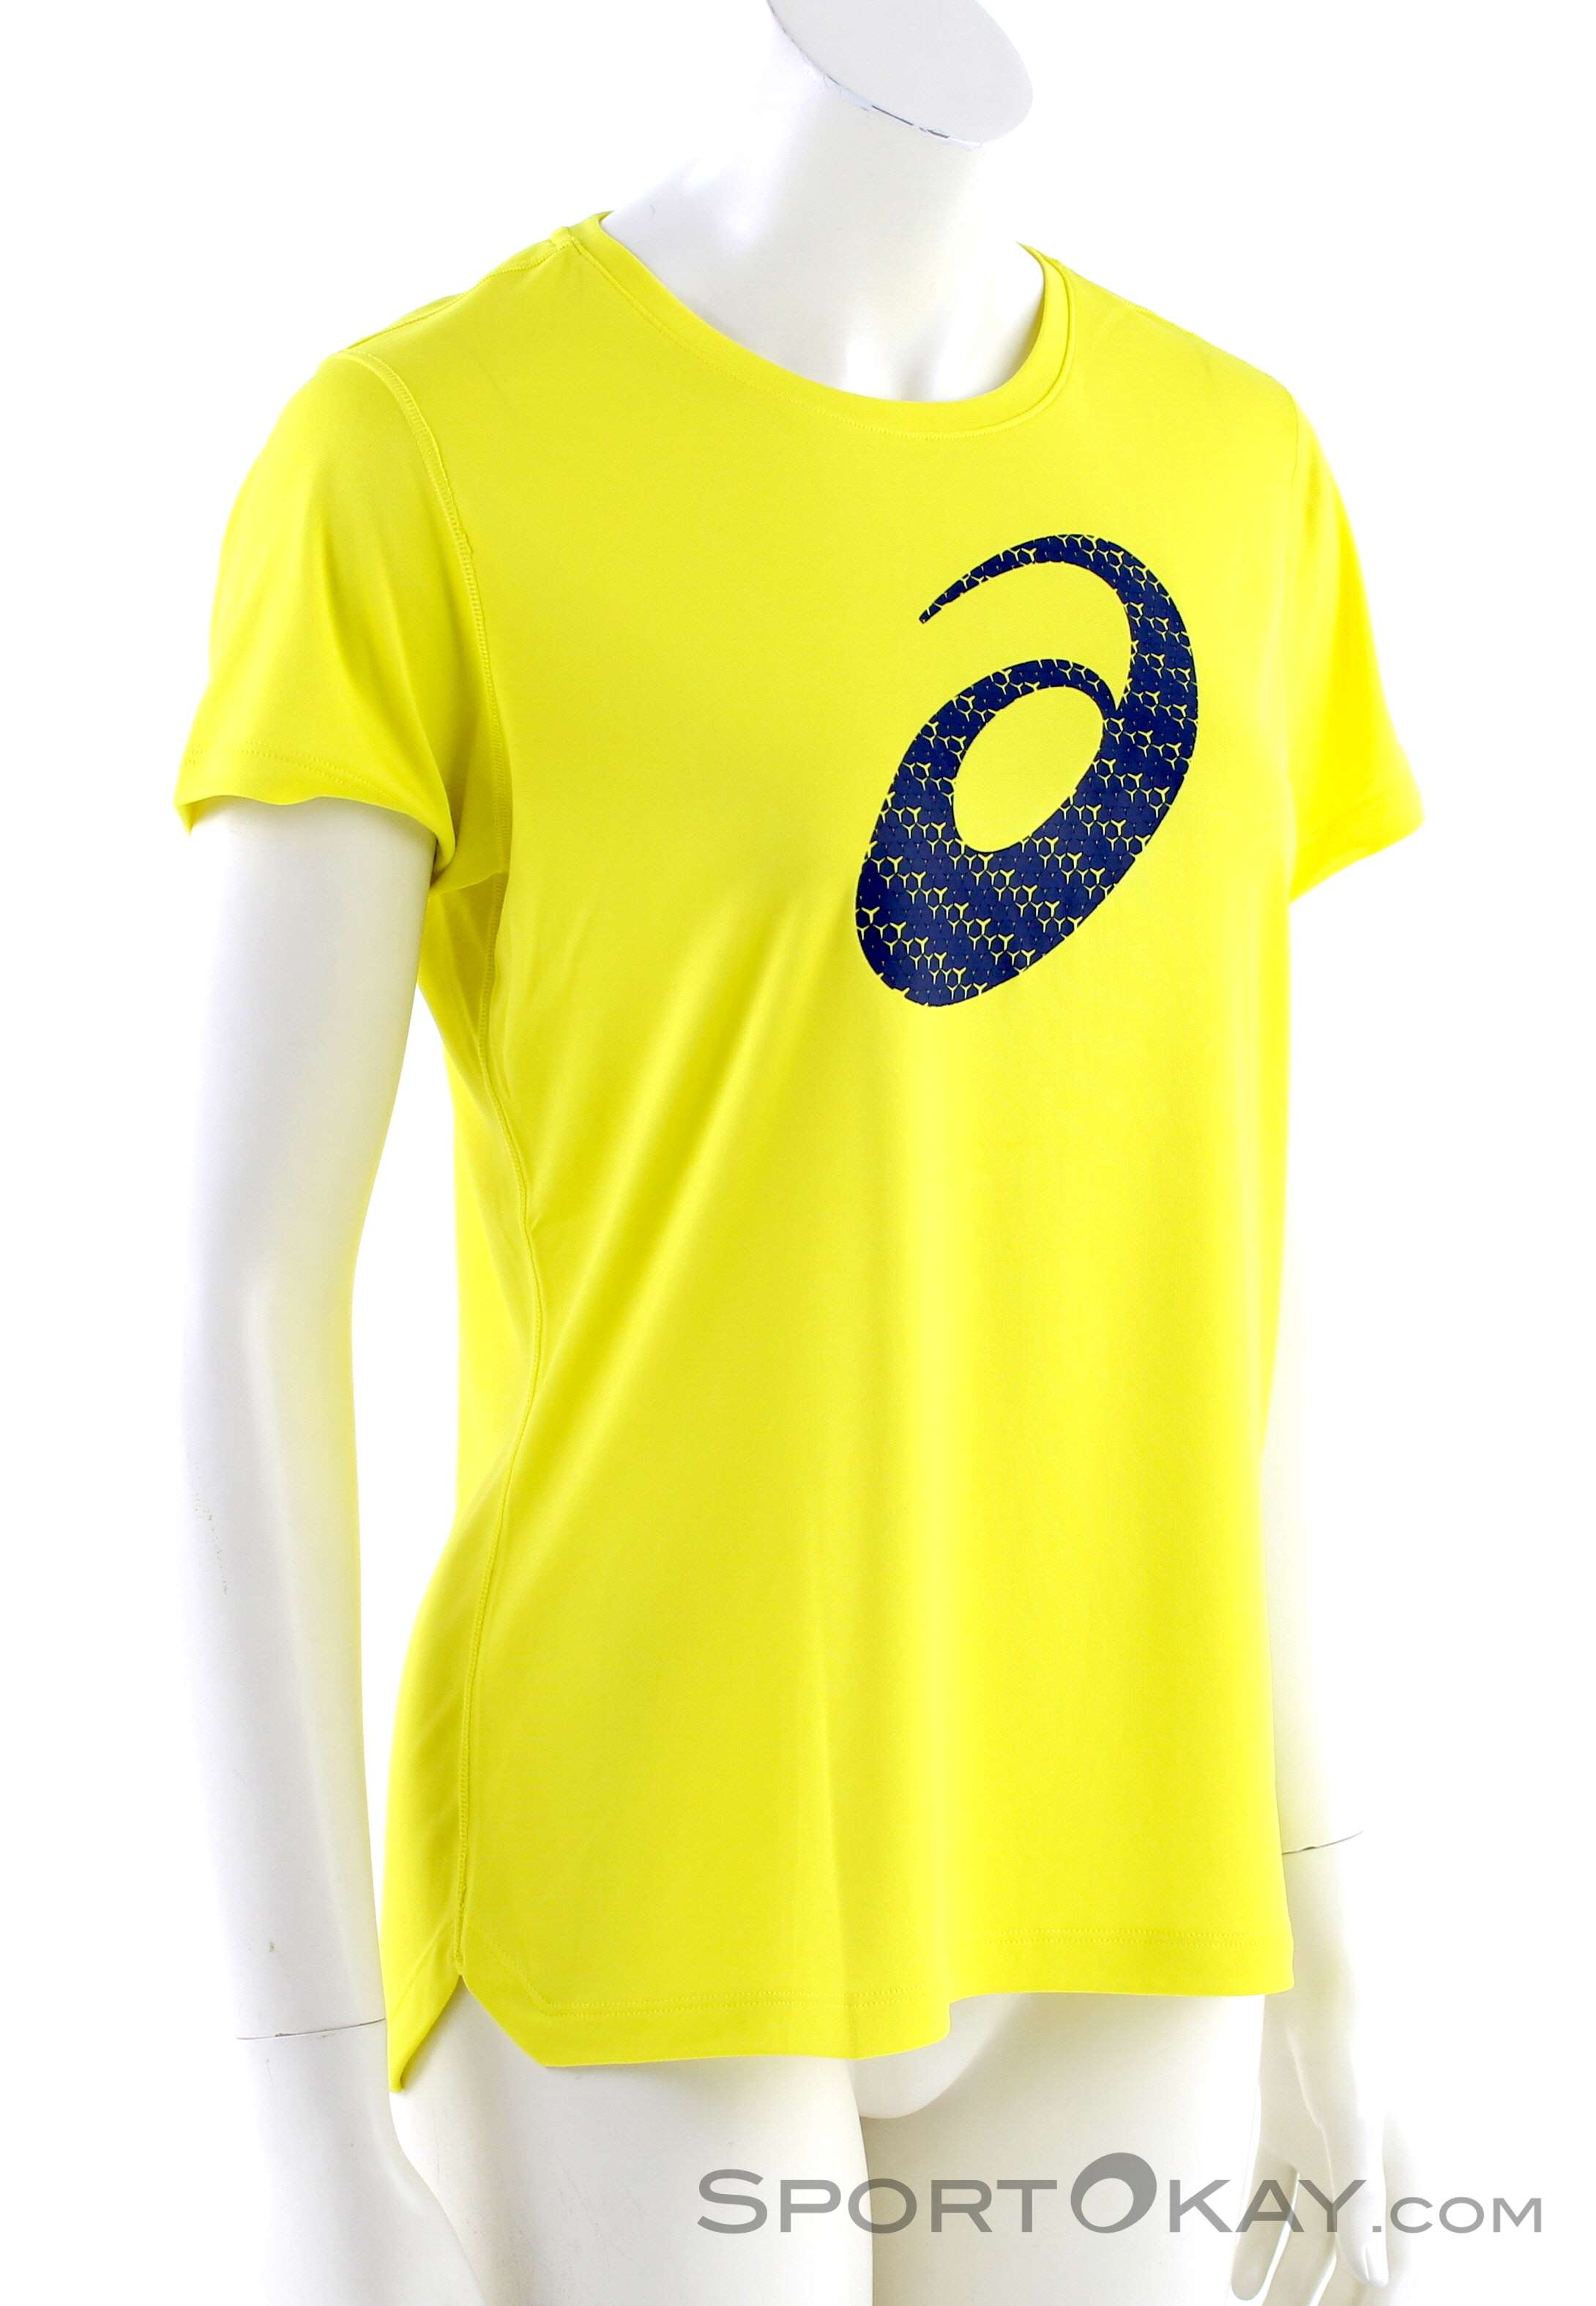 Asics Asics Silver Graphic SS Womens T Shirt